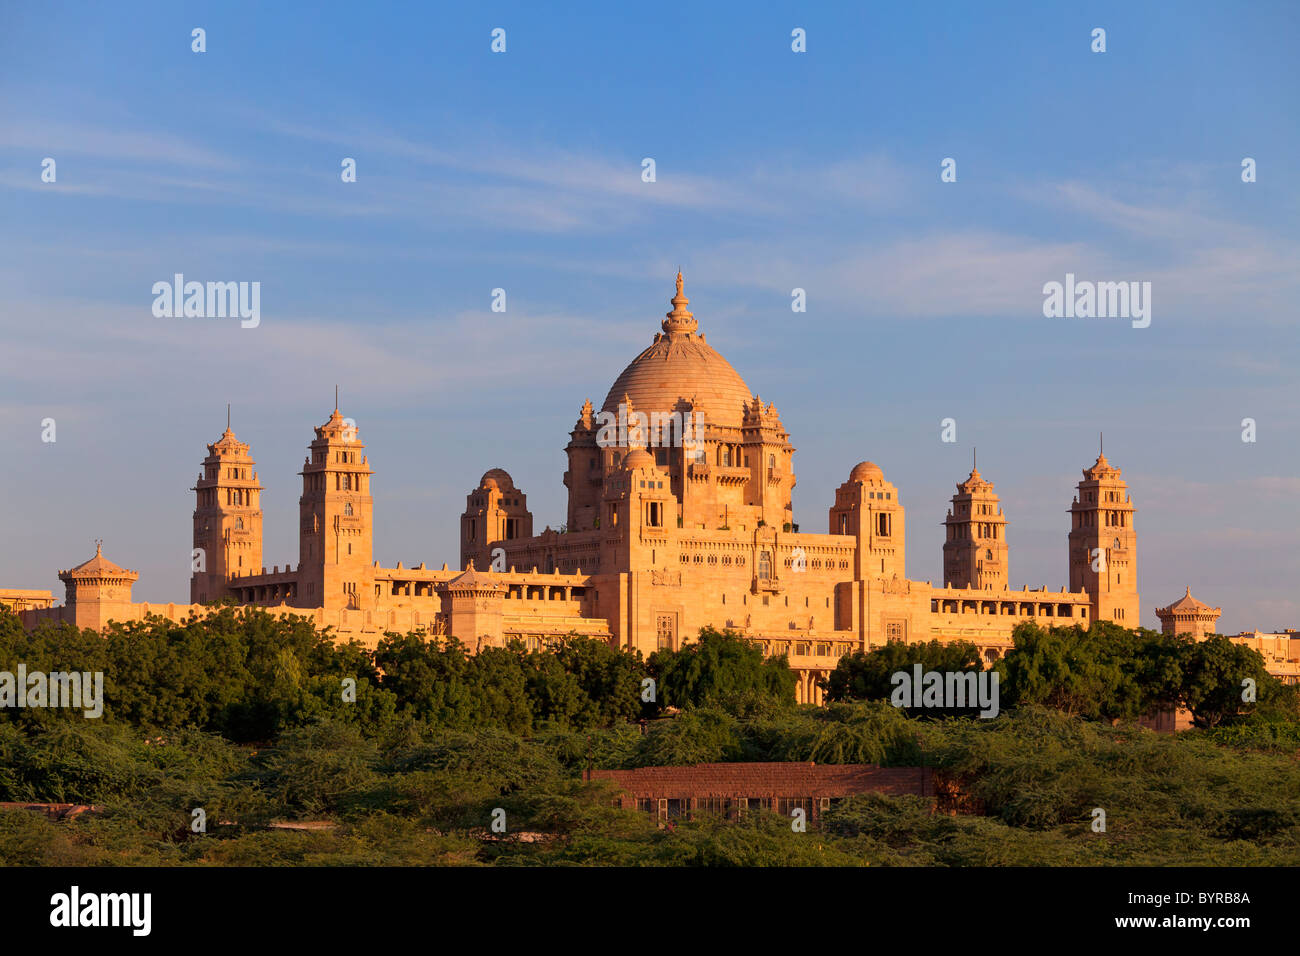 India, Rajasthan, Jodhpur, Umaid Bhavan Palace in late evening light - Stock Image